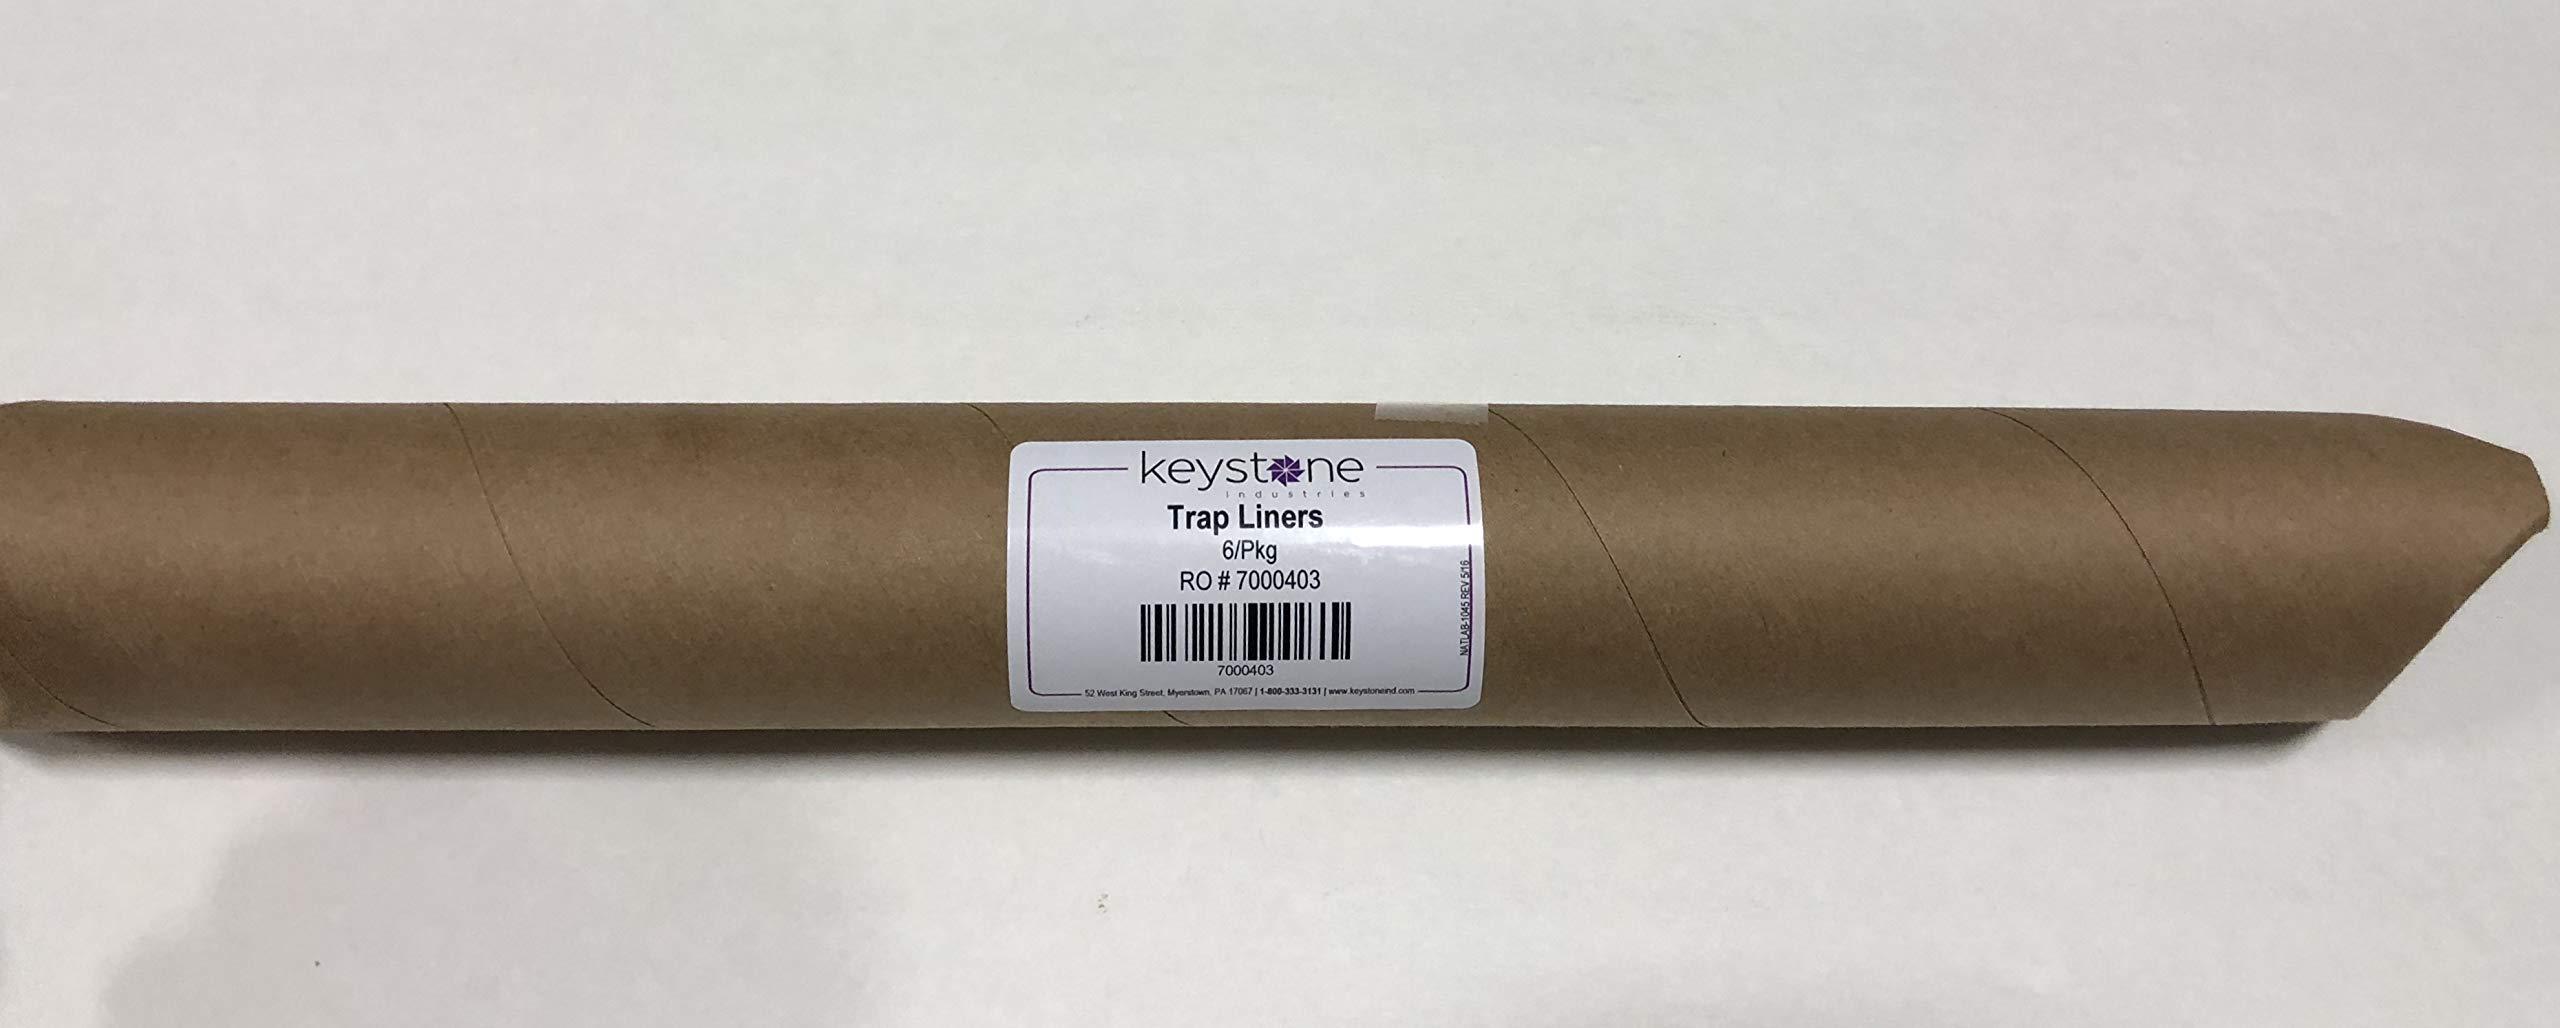 Keystone Plaster Trap Liners 7000403